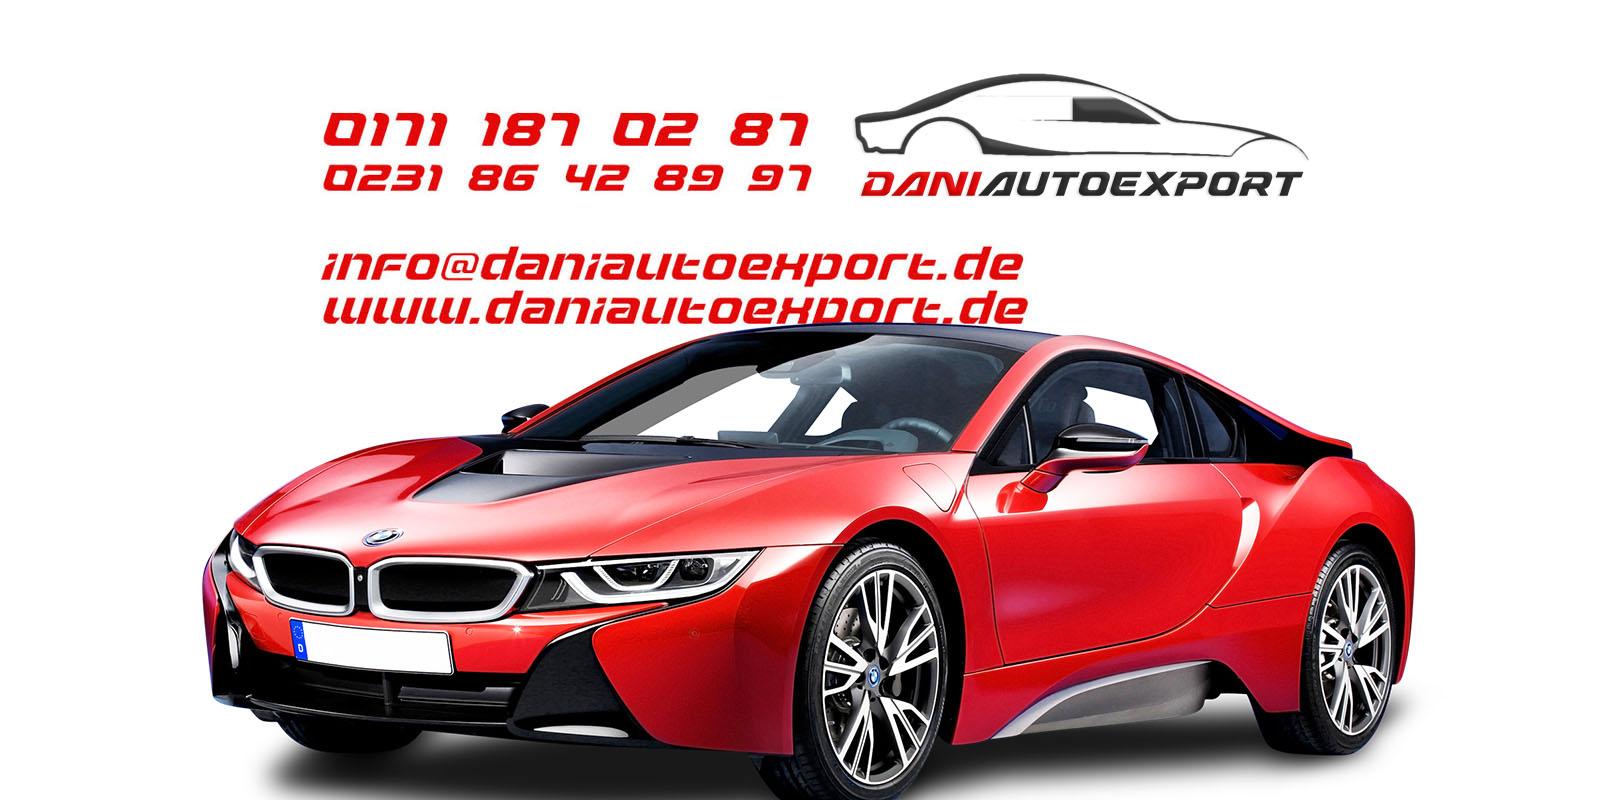 Autoexport Duesseldorf